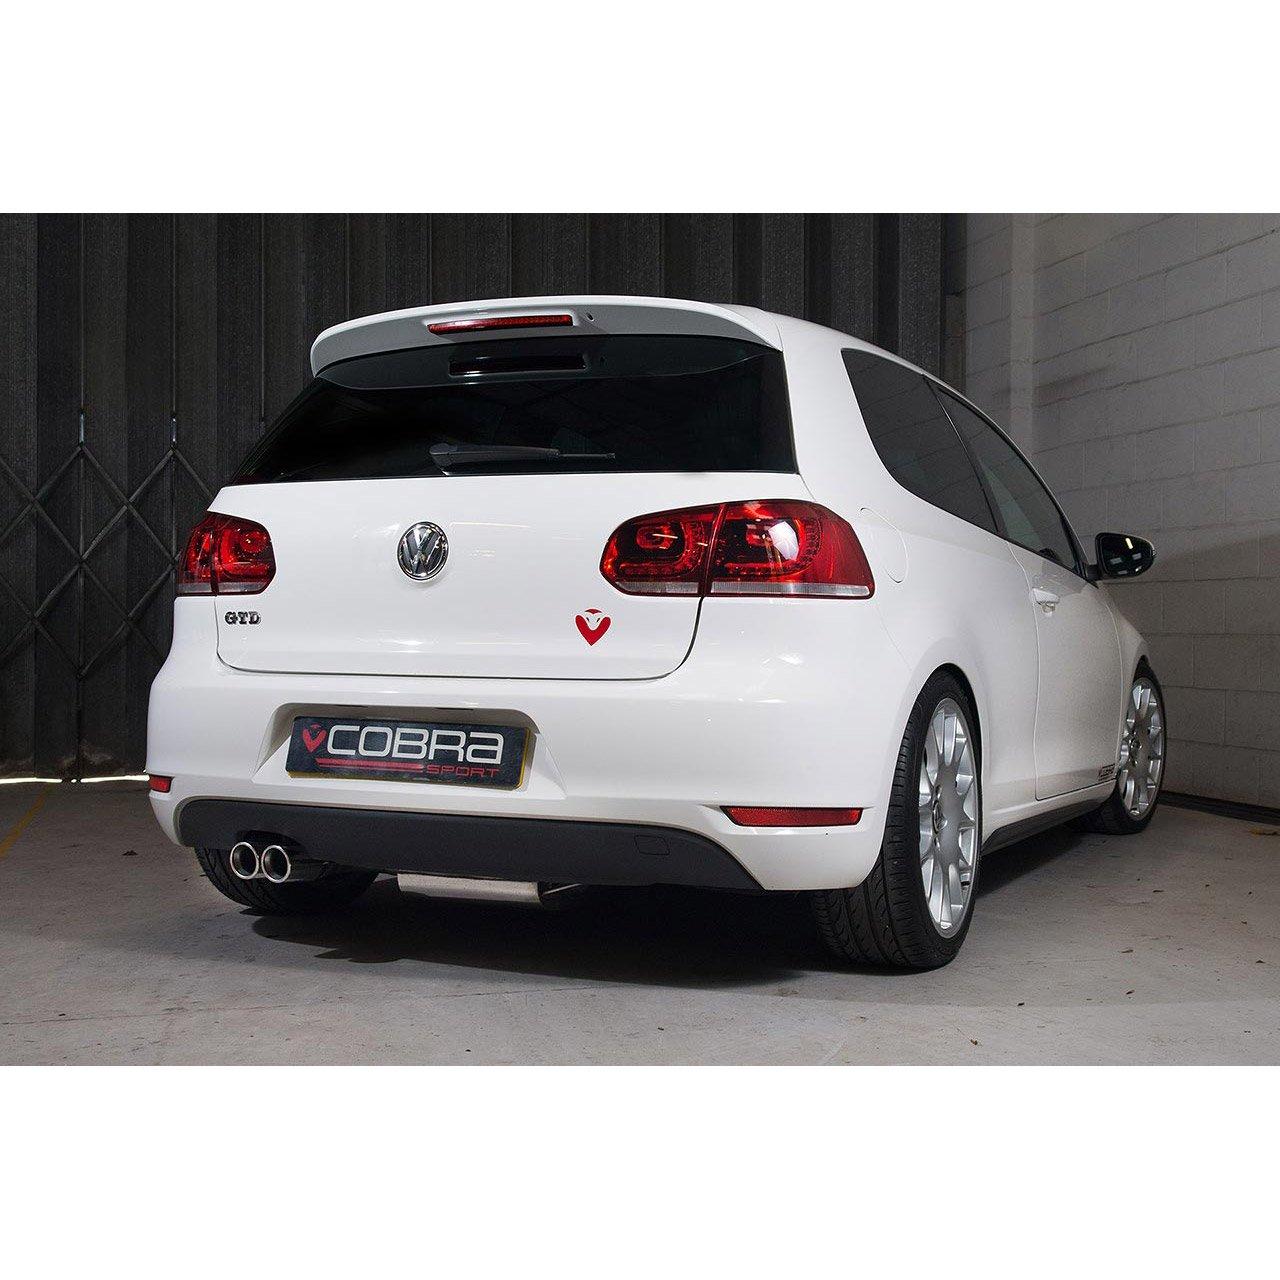 VW Golf GT (MK6) 2.0 TDi 140PS (5K) (09-13) Cat Back Performance Exhaust